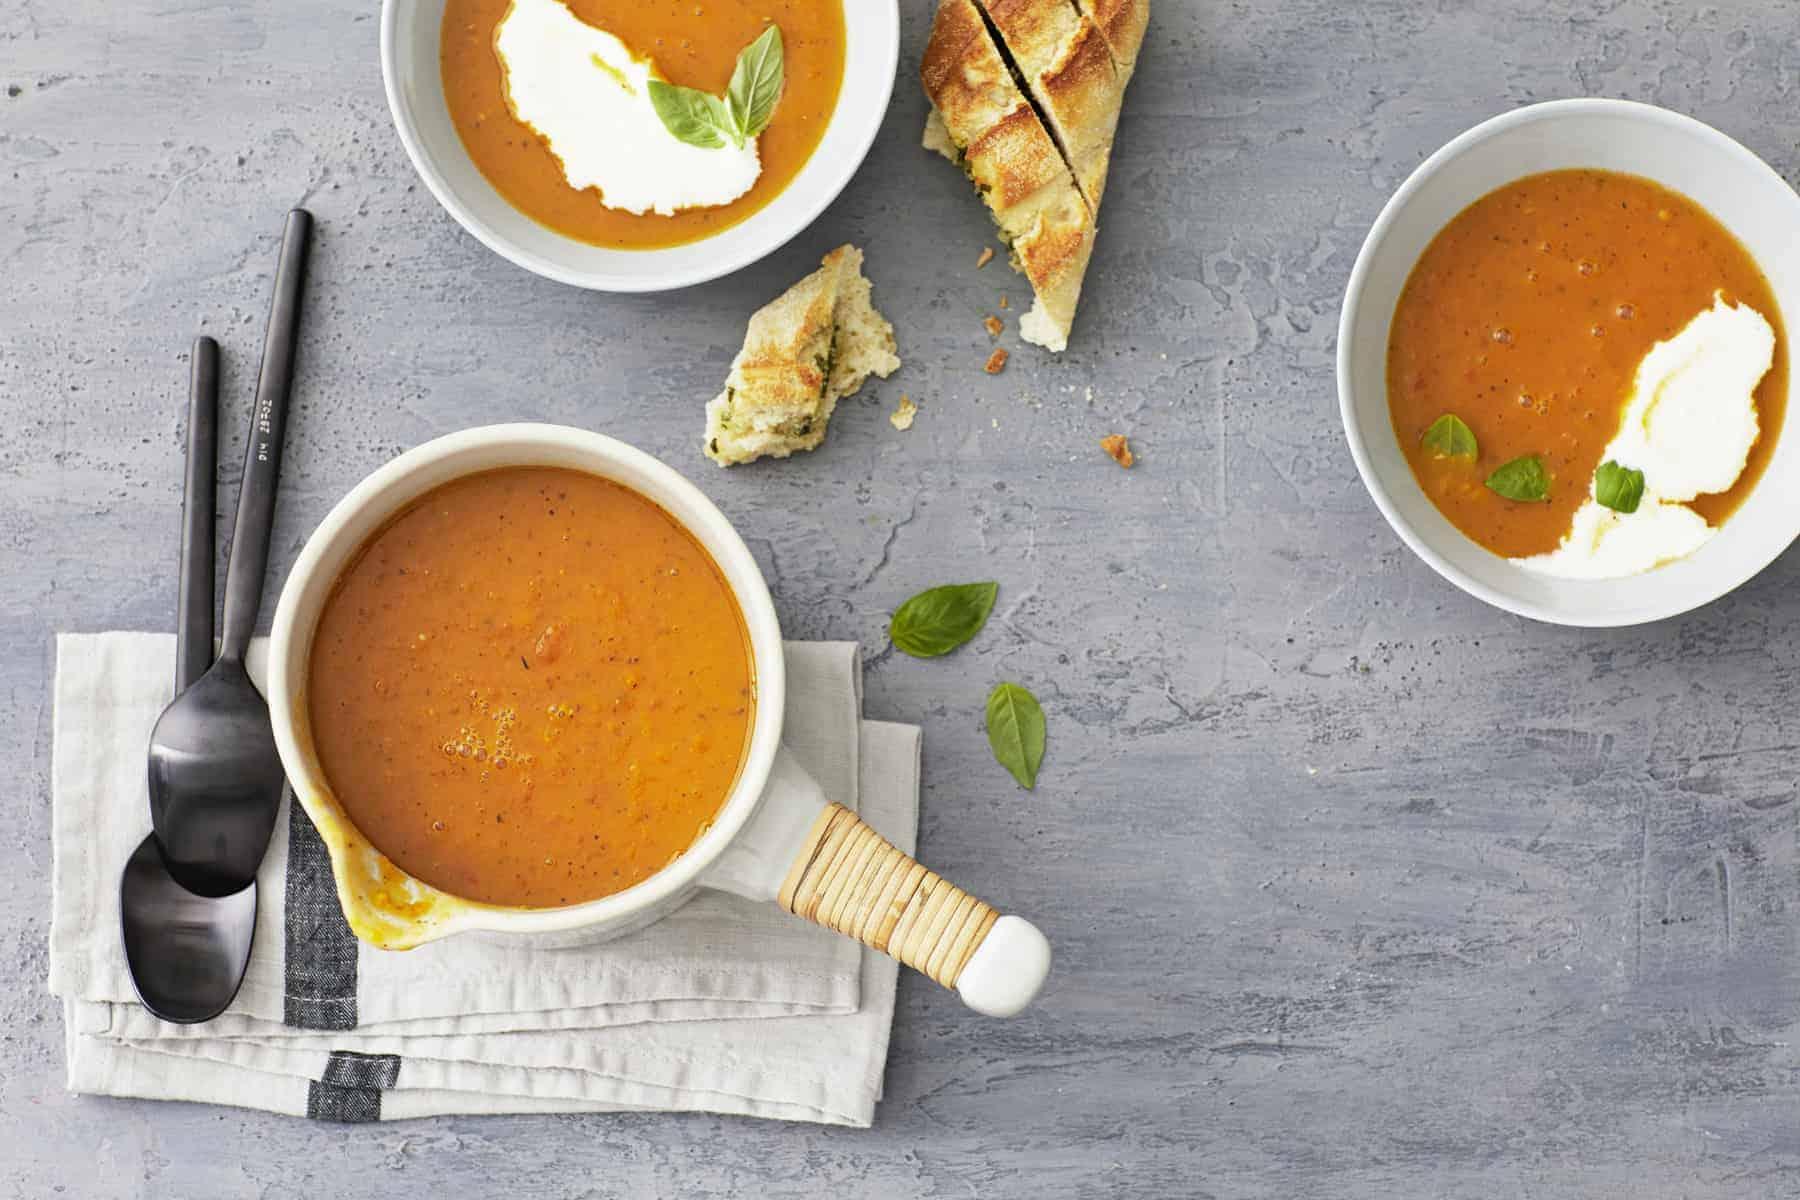 Kürbis-Tomaten-Suppe aus dem Thermomix® –Foto: Jorma Gottwald